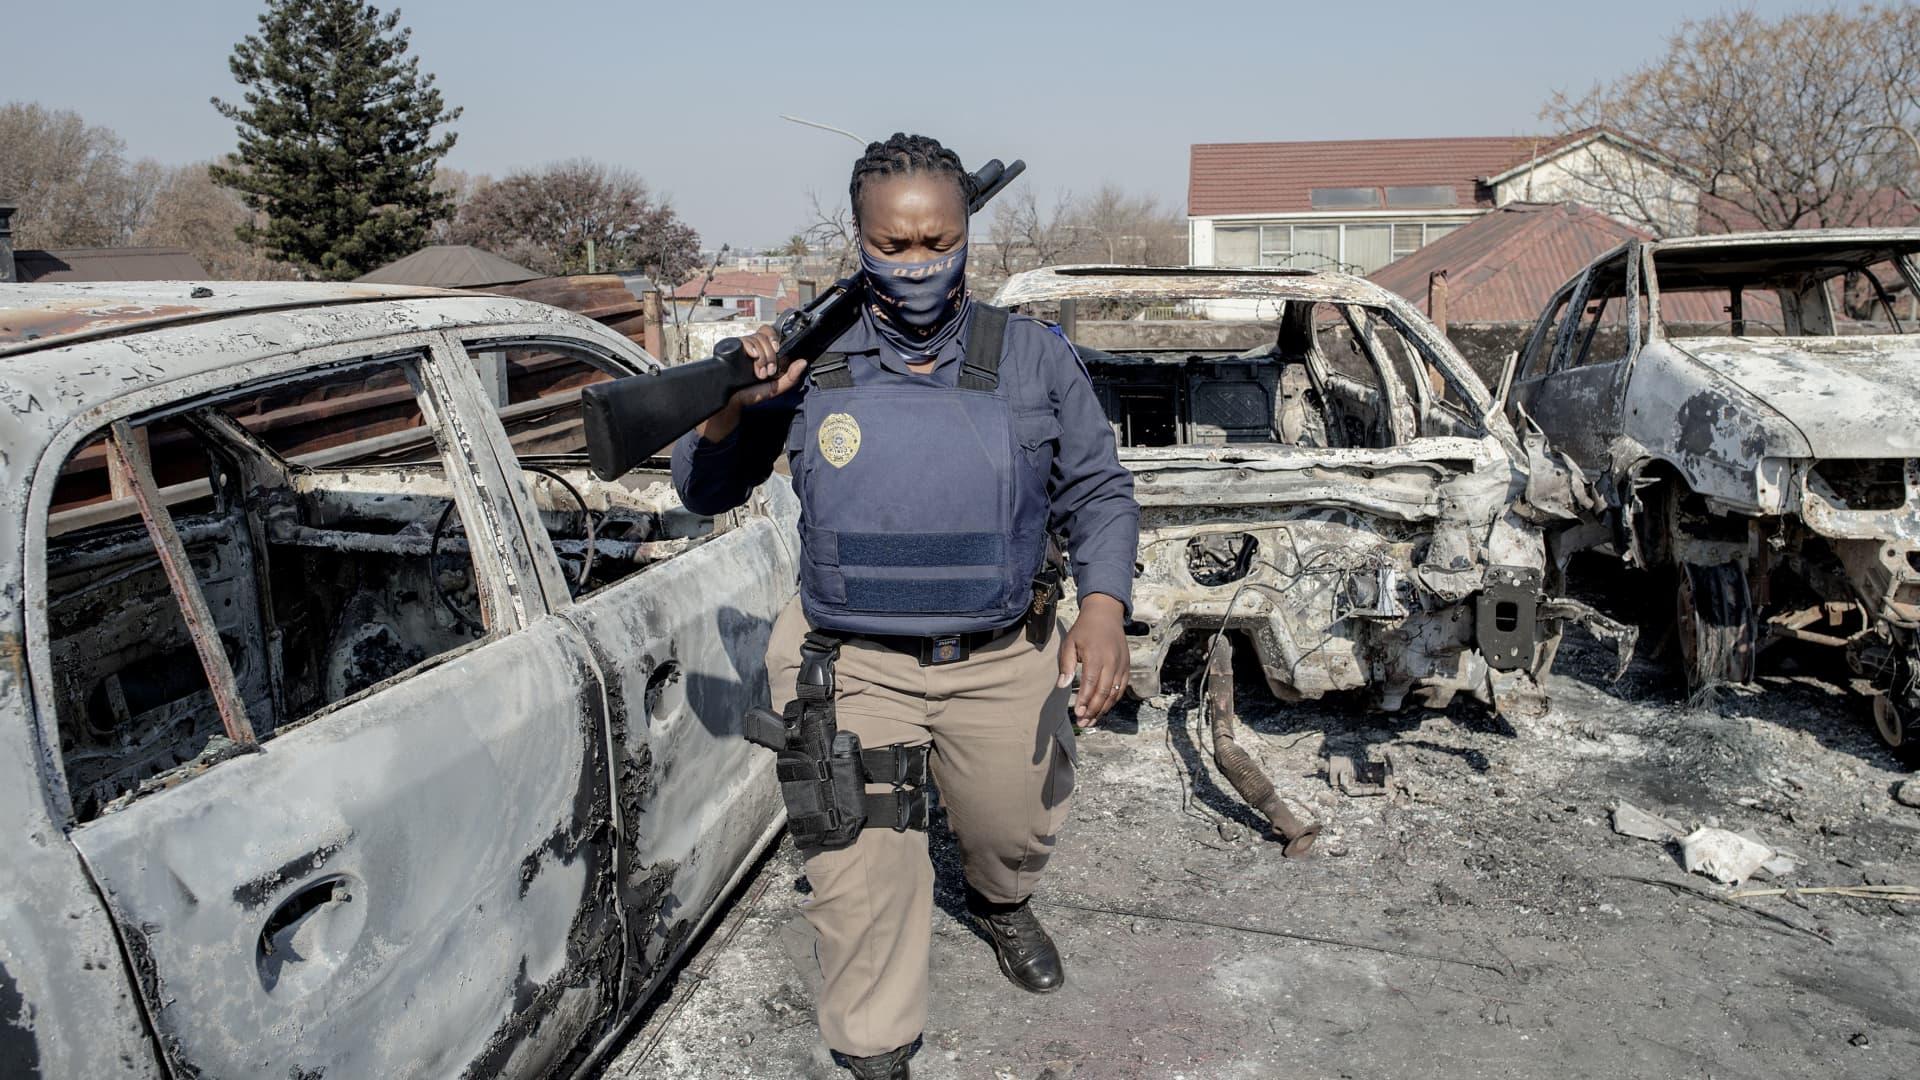 A Johannesburg Metro Police Department (JMPD) officer walks between burnt cars at a car showroom in Jeppestown, Johannesburg, on July 11, 2021.